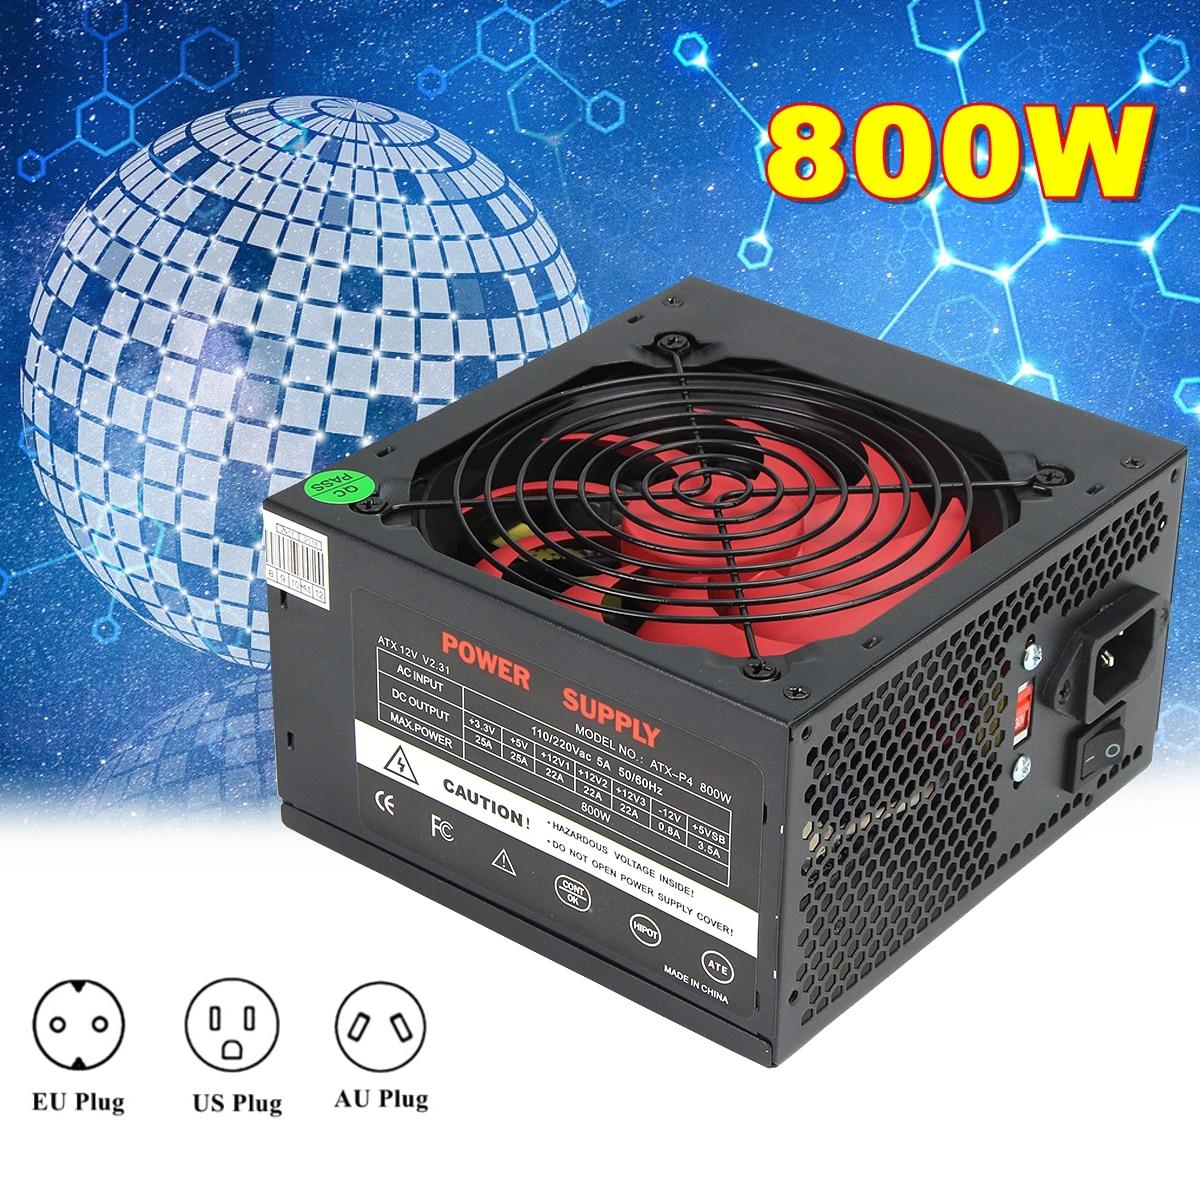 все цены на Black 800W 800 Watt Power Supply 120mm Fan 24 Pin PCI SATA ATX 12V Molex Connect Computer Power Supply 80+Gold онлайн